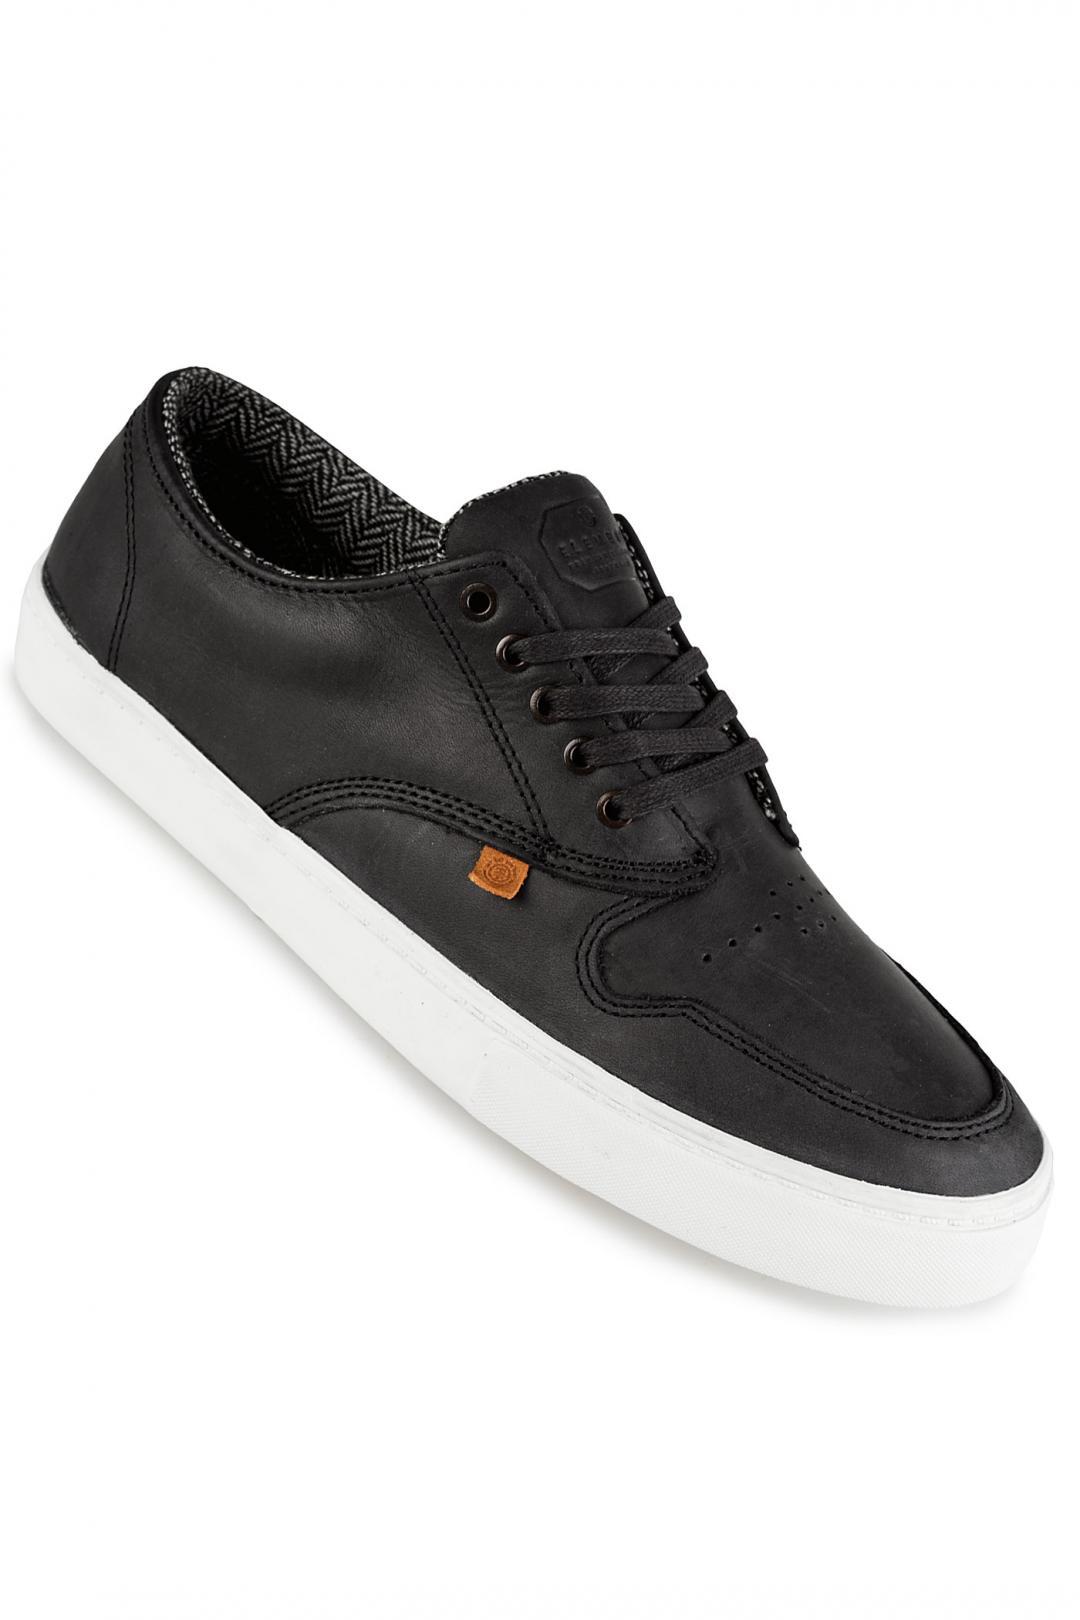 Uomo Element Topaz C3 black premium   Scarpe da skate